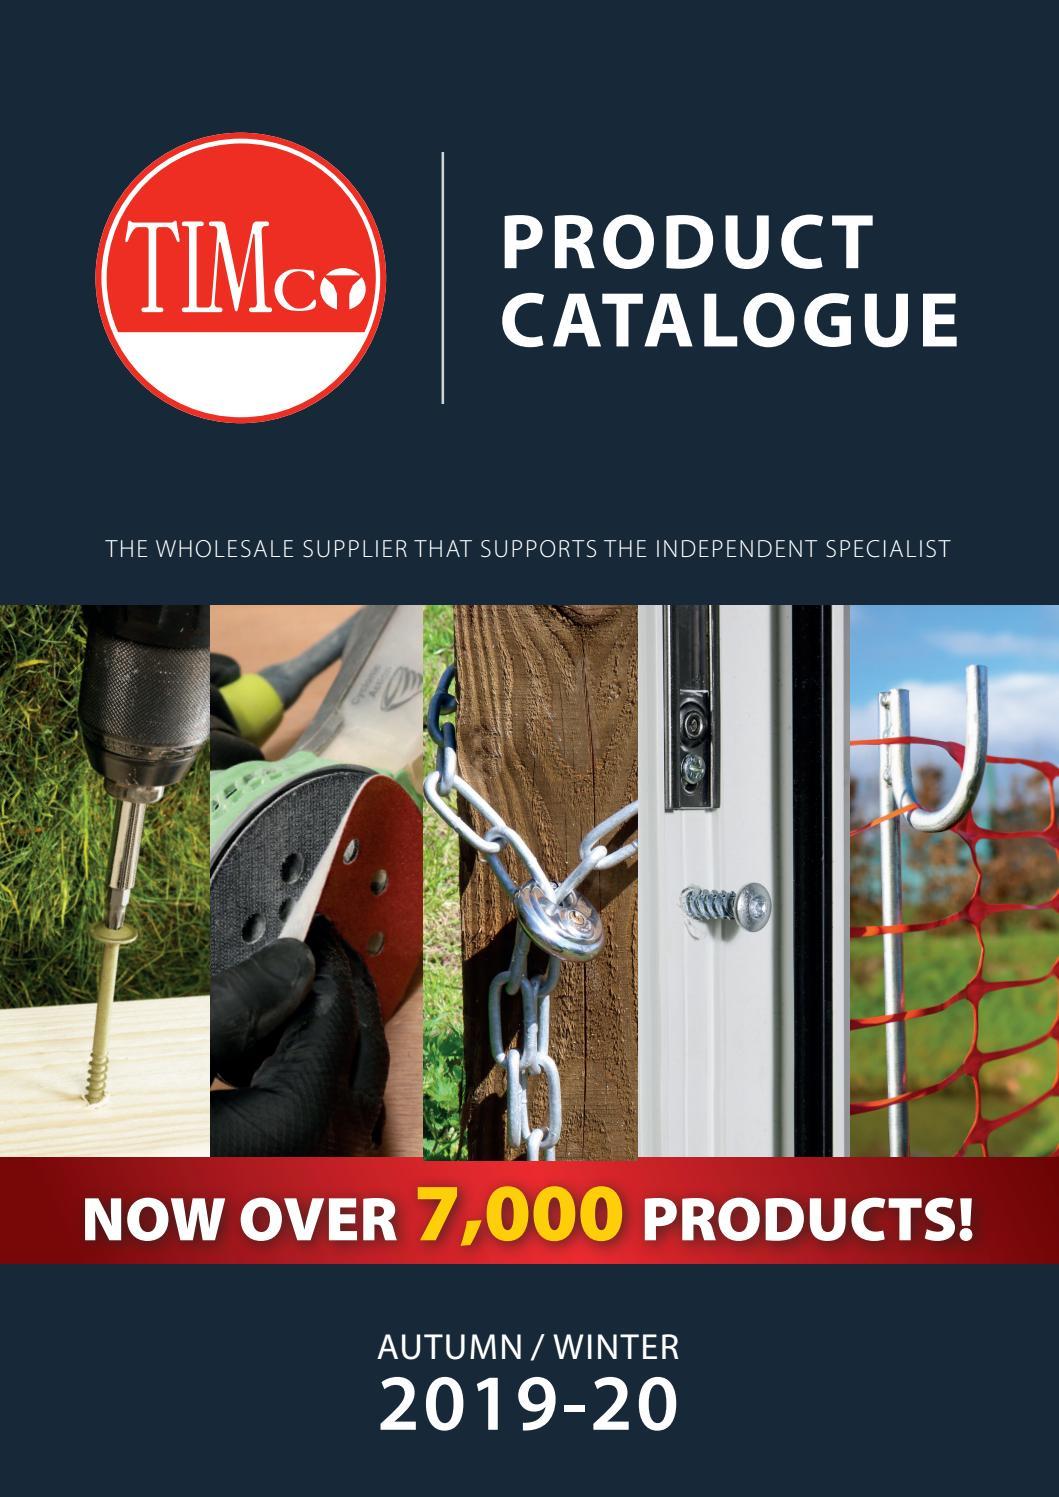 250x TIMCO 4.5 x 75mm C2 Exterior Outdoor Wood Decking Screws T20 Torx Head Bit